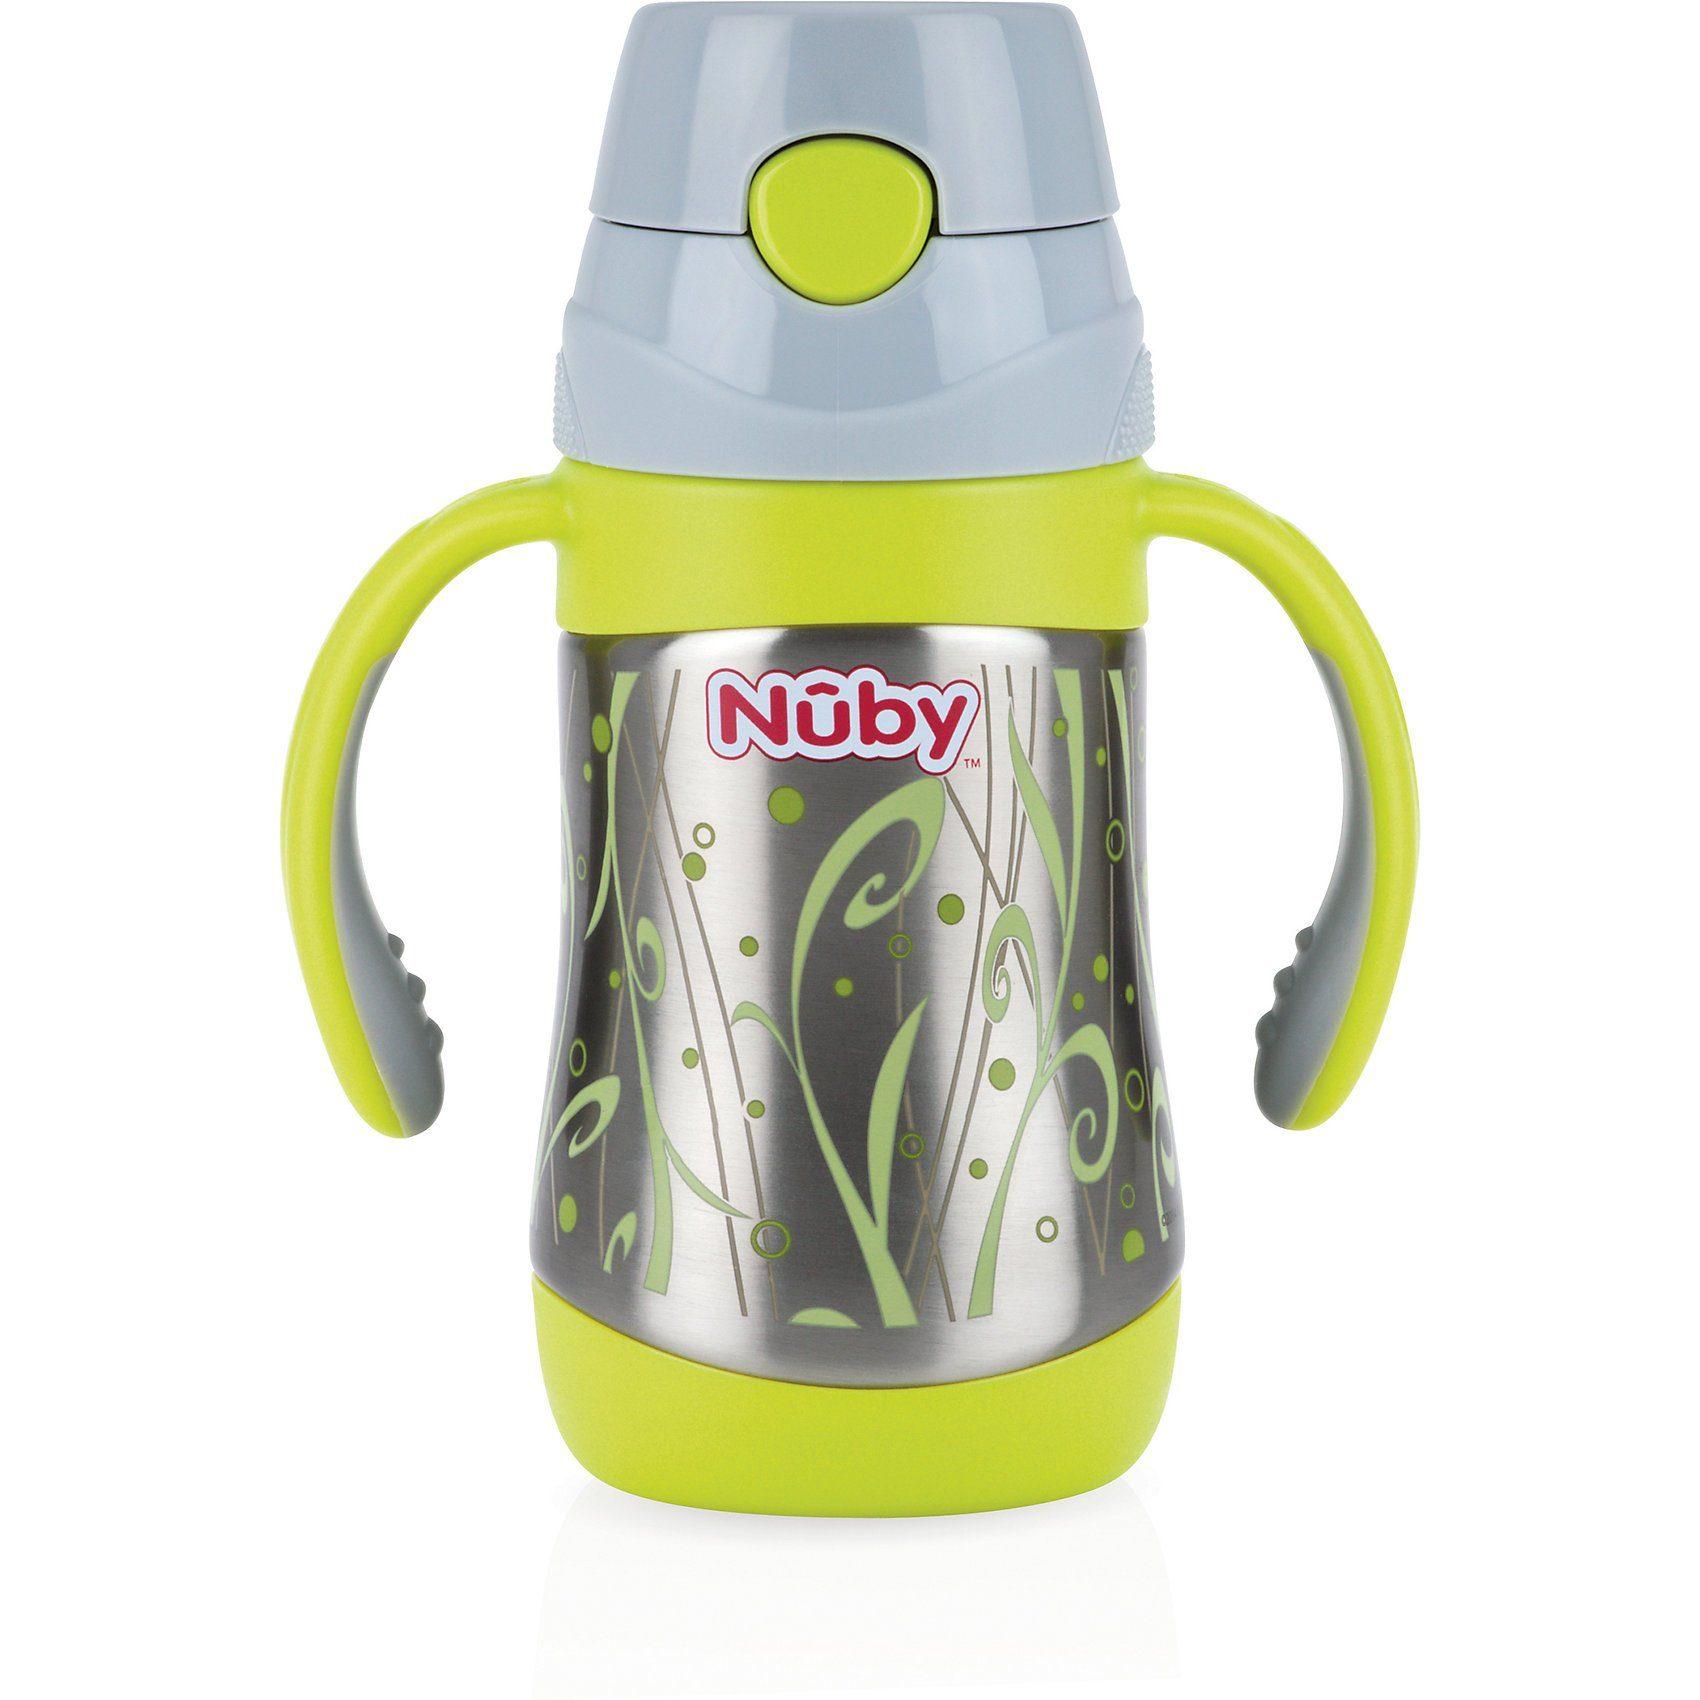 Nuby Thermo Trinkhalmflasche Clik-It, Edelstahl, 280 ml